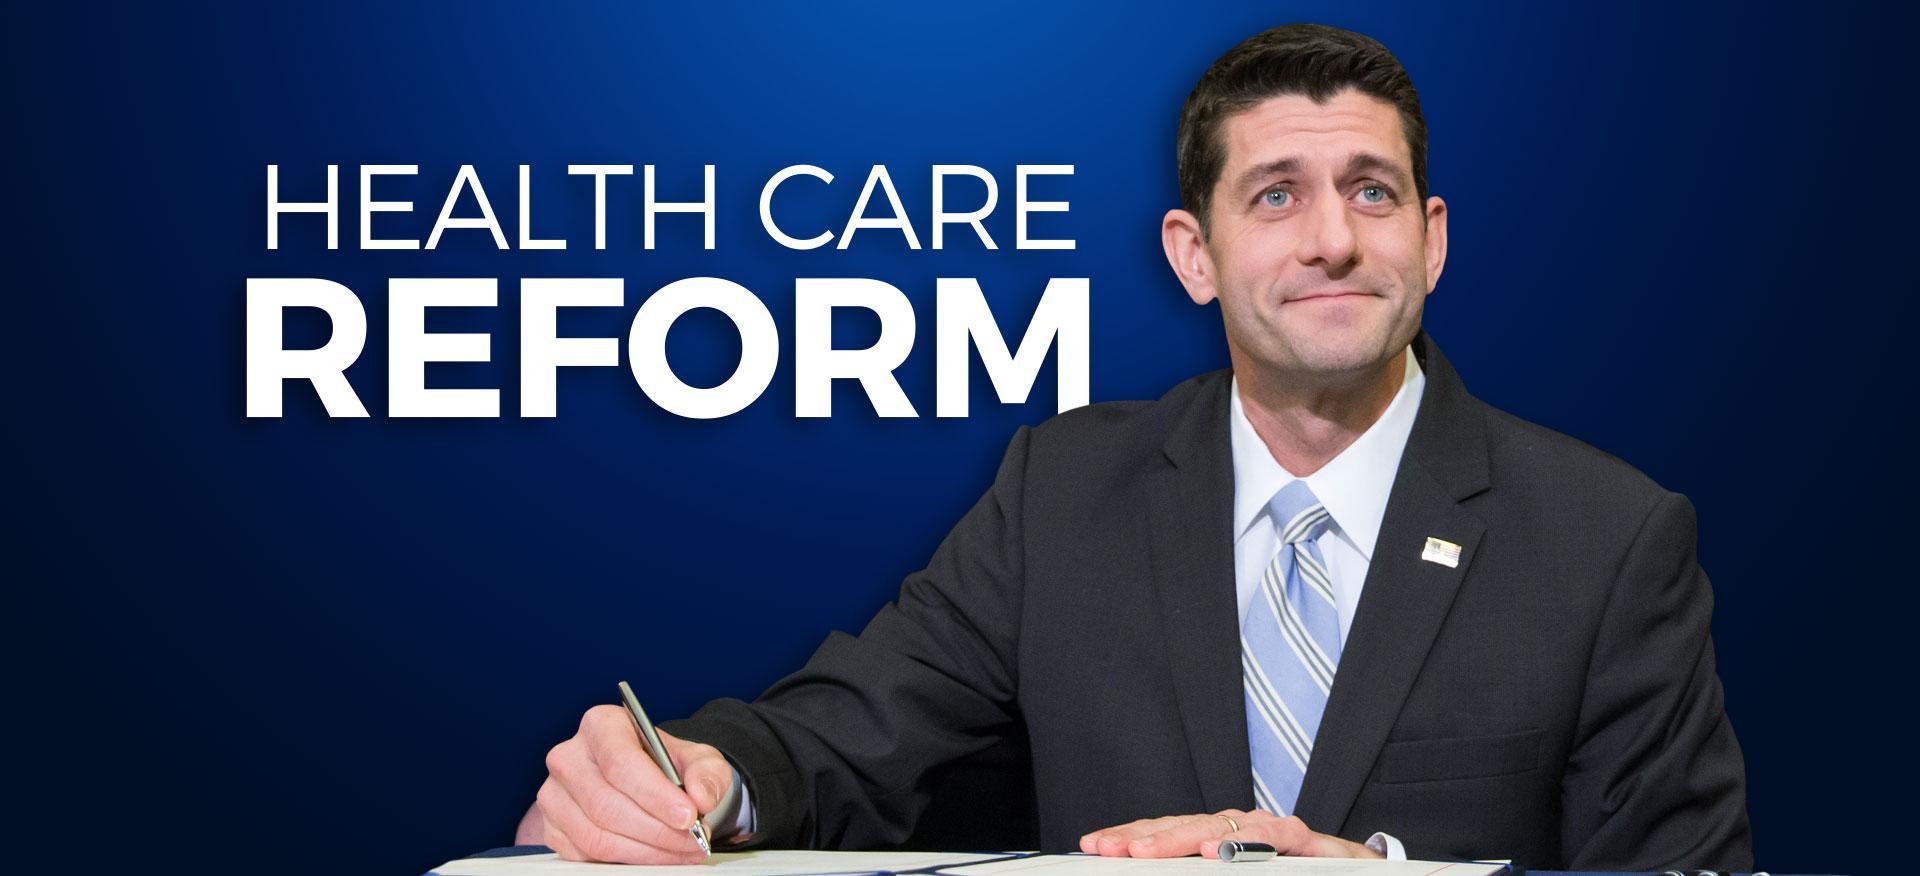 Health / Health Care Reform News, Videos & Top Stories